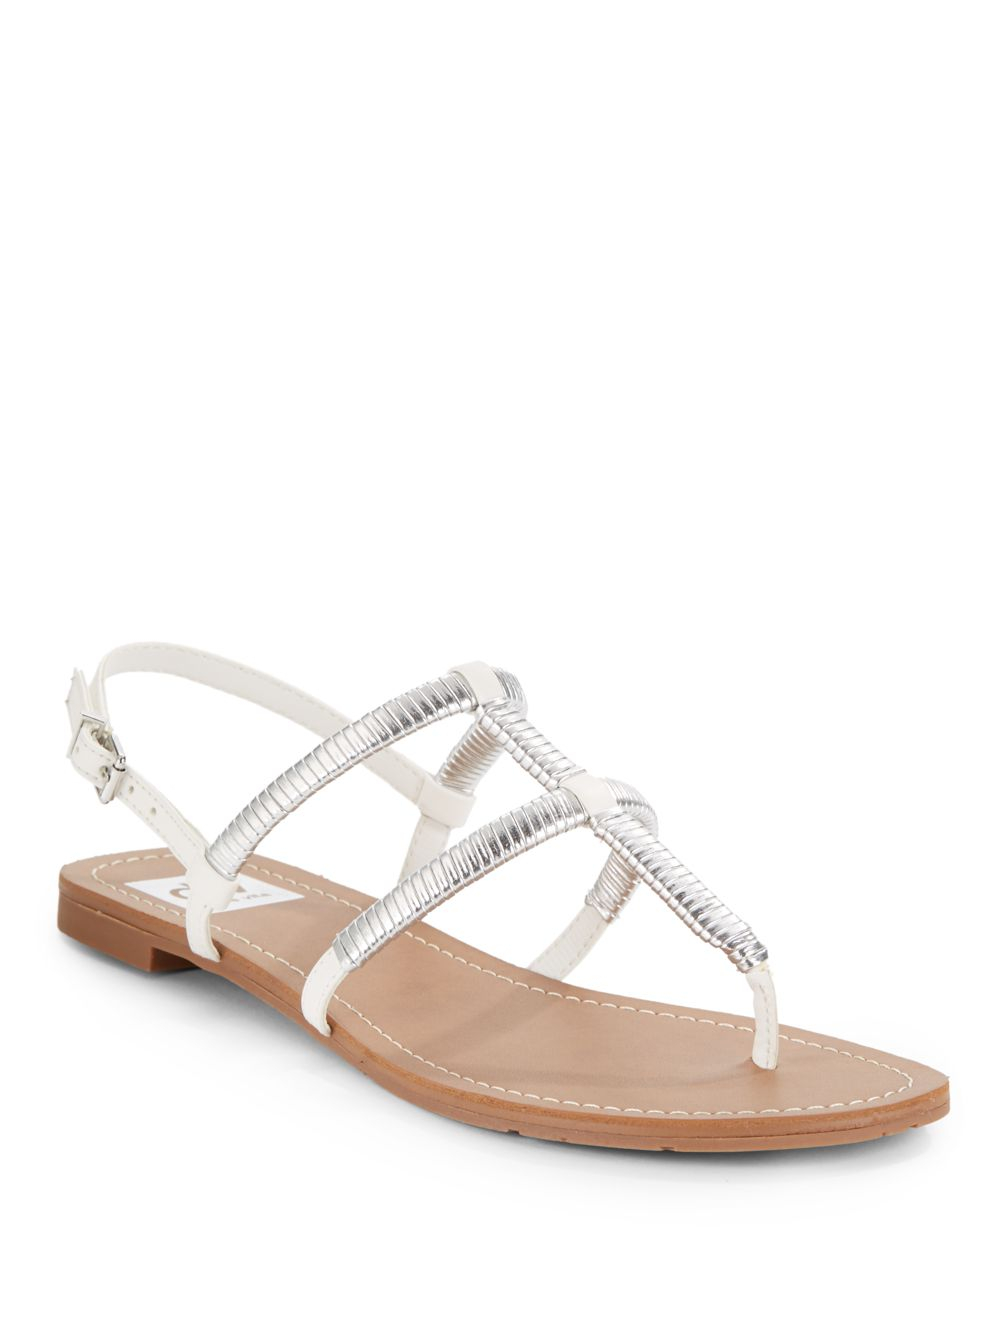 Dv By Dolce Vita Gava Silver Metallic Trimmed Flat Sandals